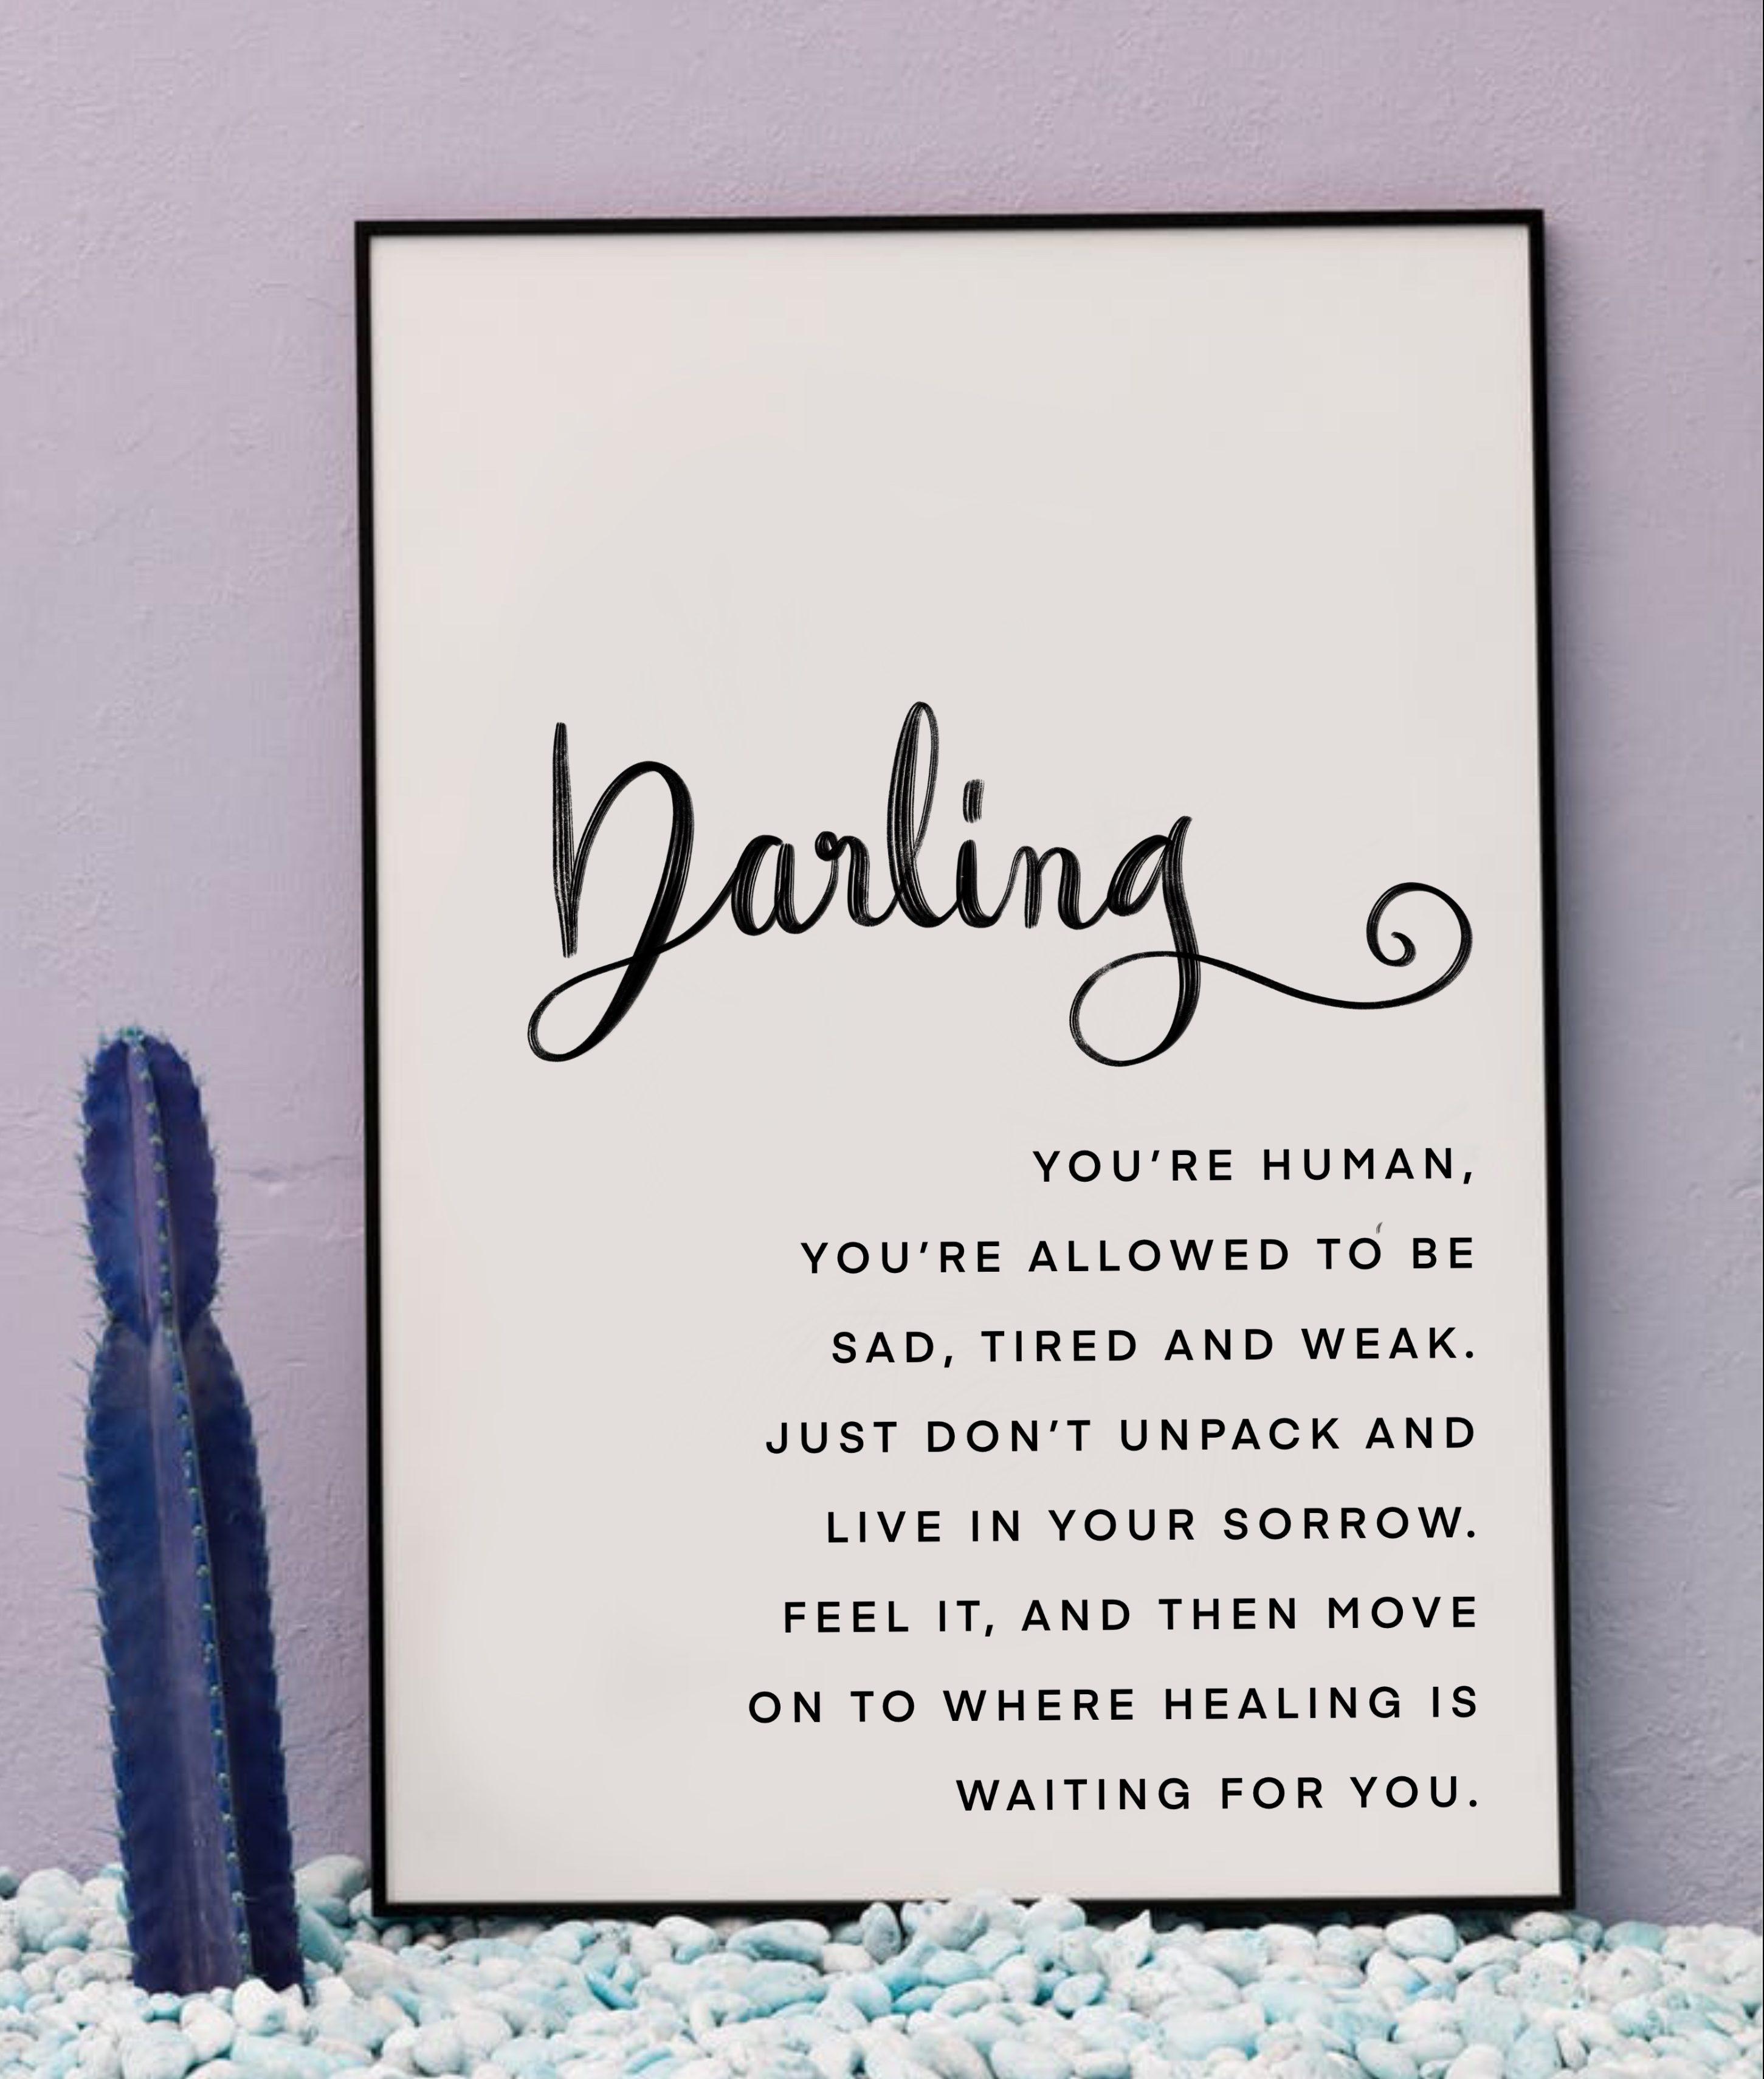 FREE 'Darling' Typography Poster Download - Eva Hussain